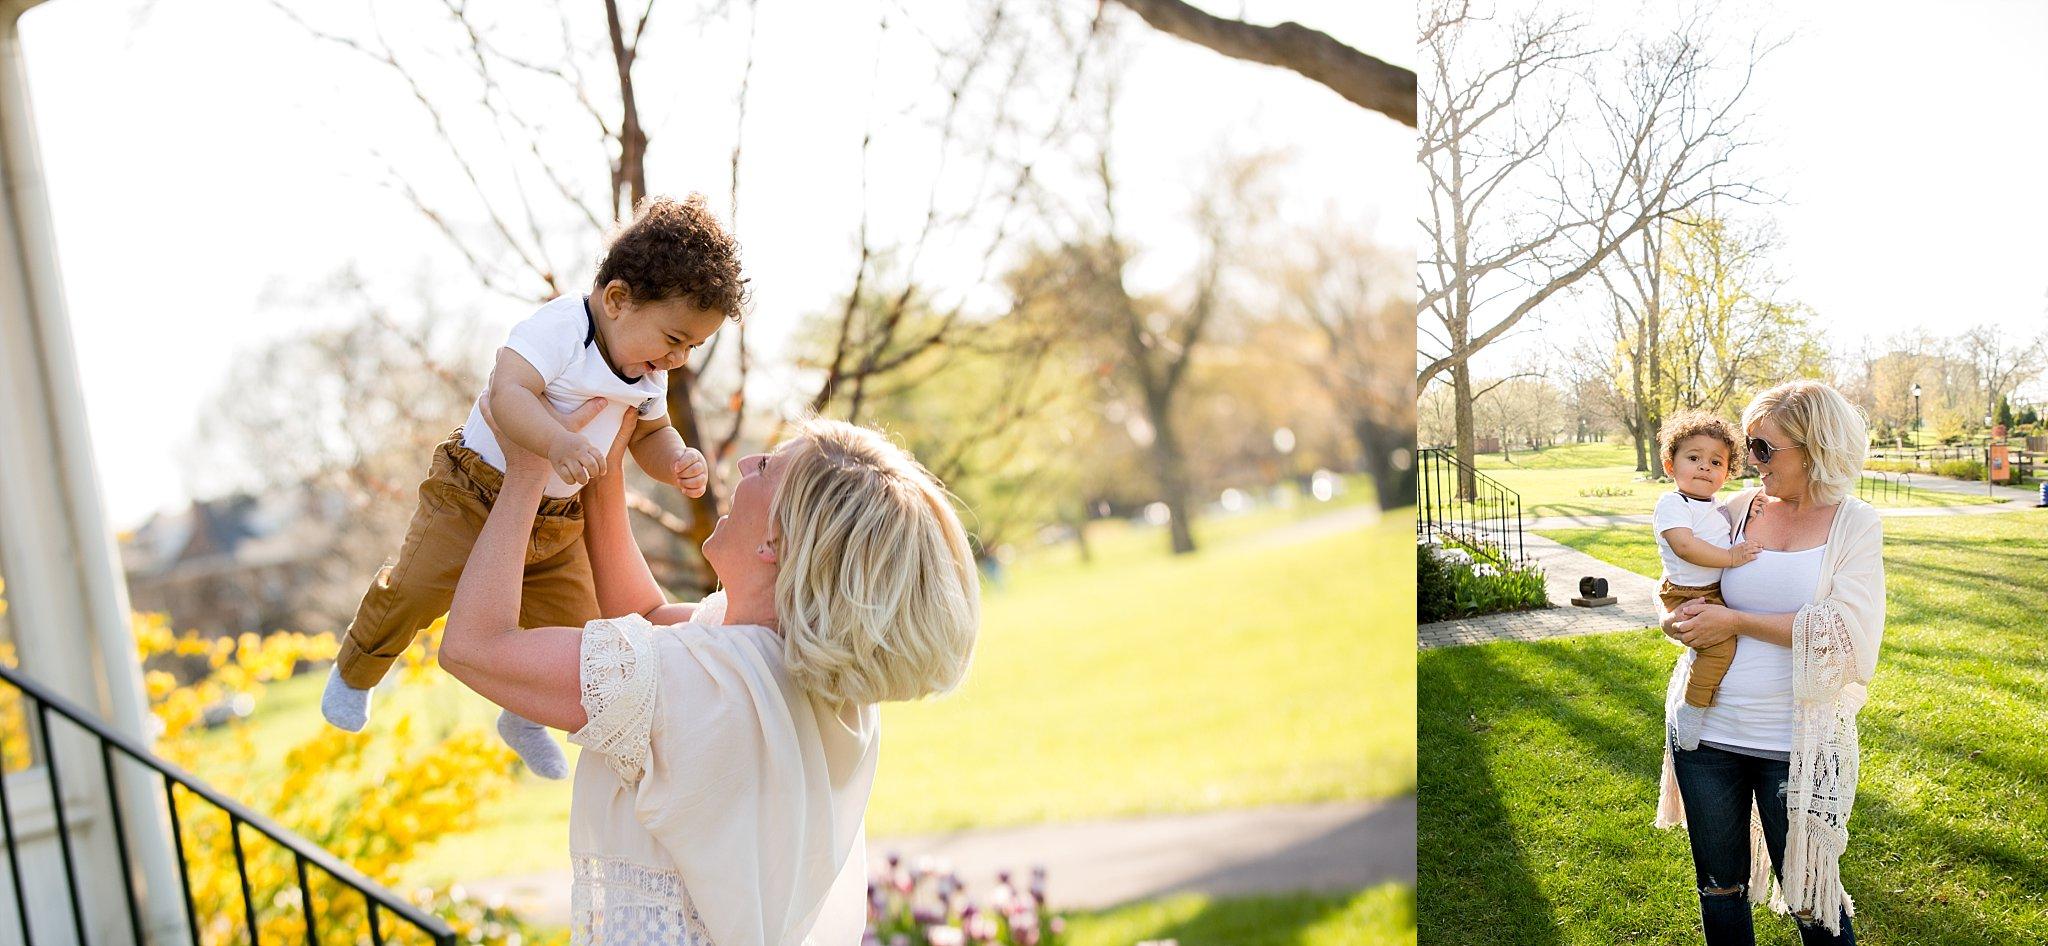 Baby Photos in Columbus, Ohio